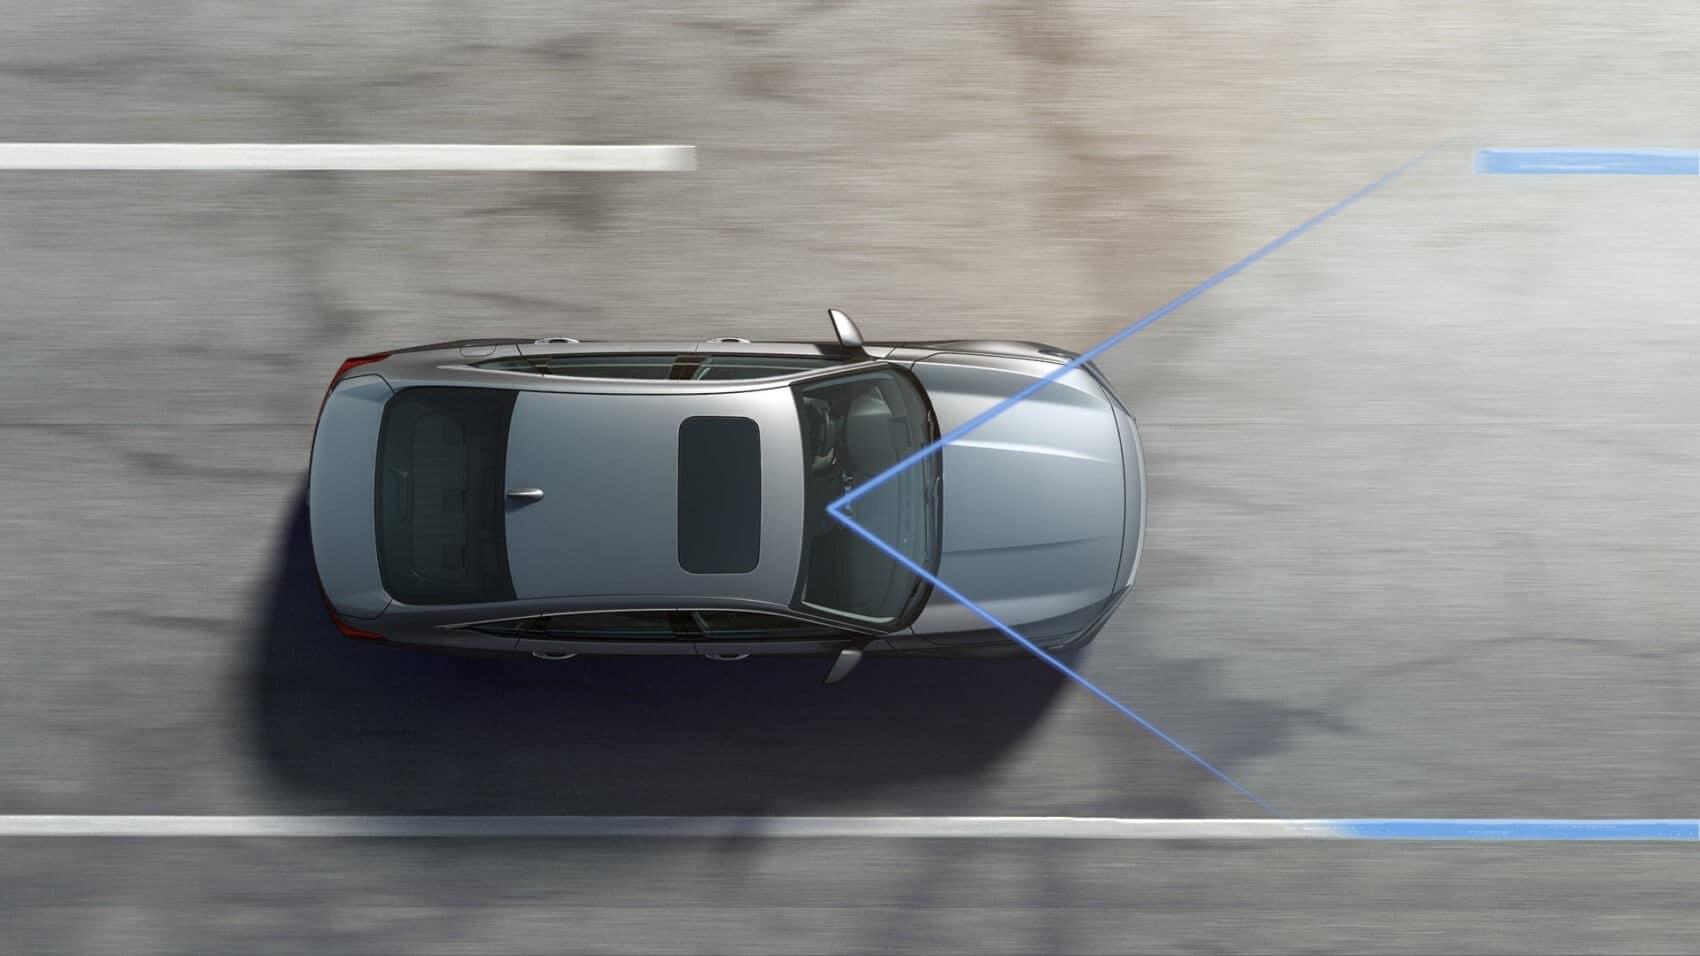 Honda Accord driving while using Honda Sensing®